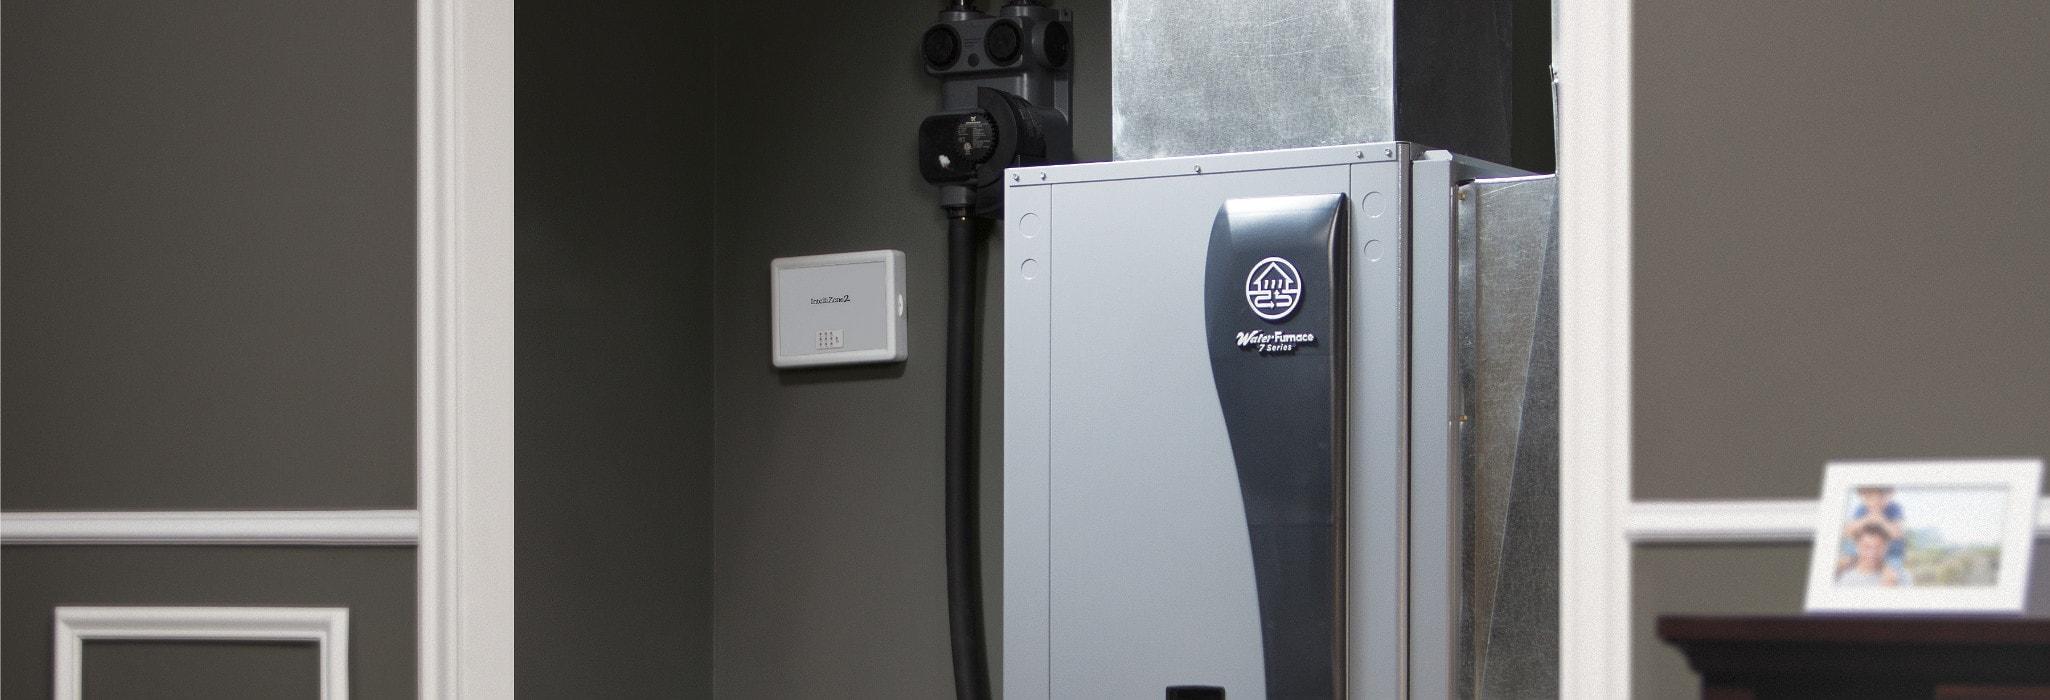 WaterFurnace 700 Series Installation